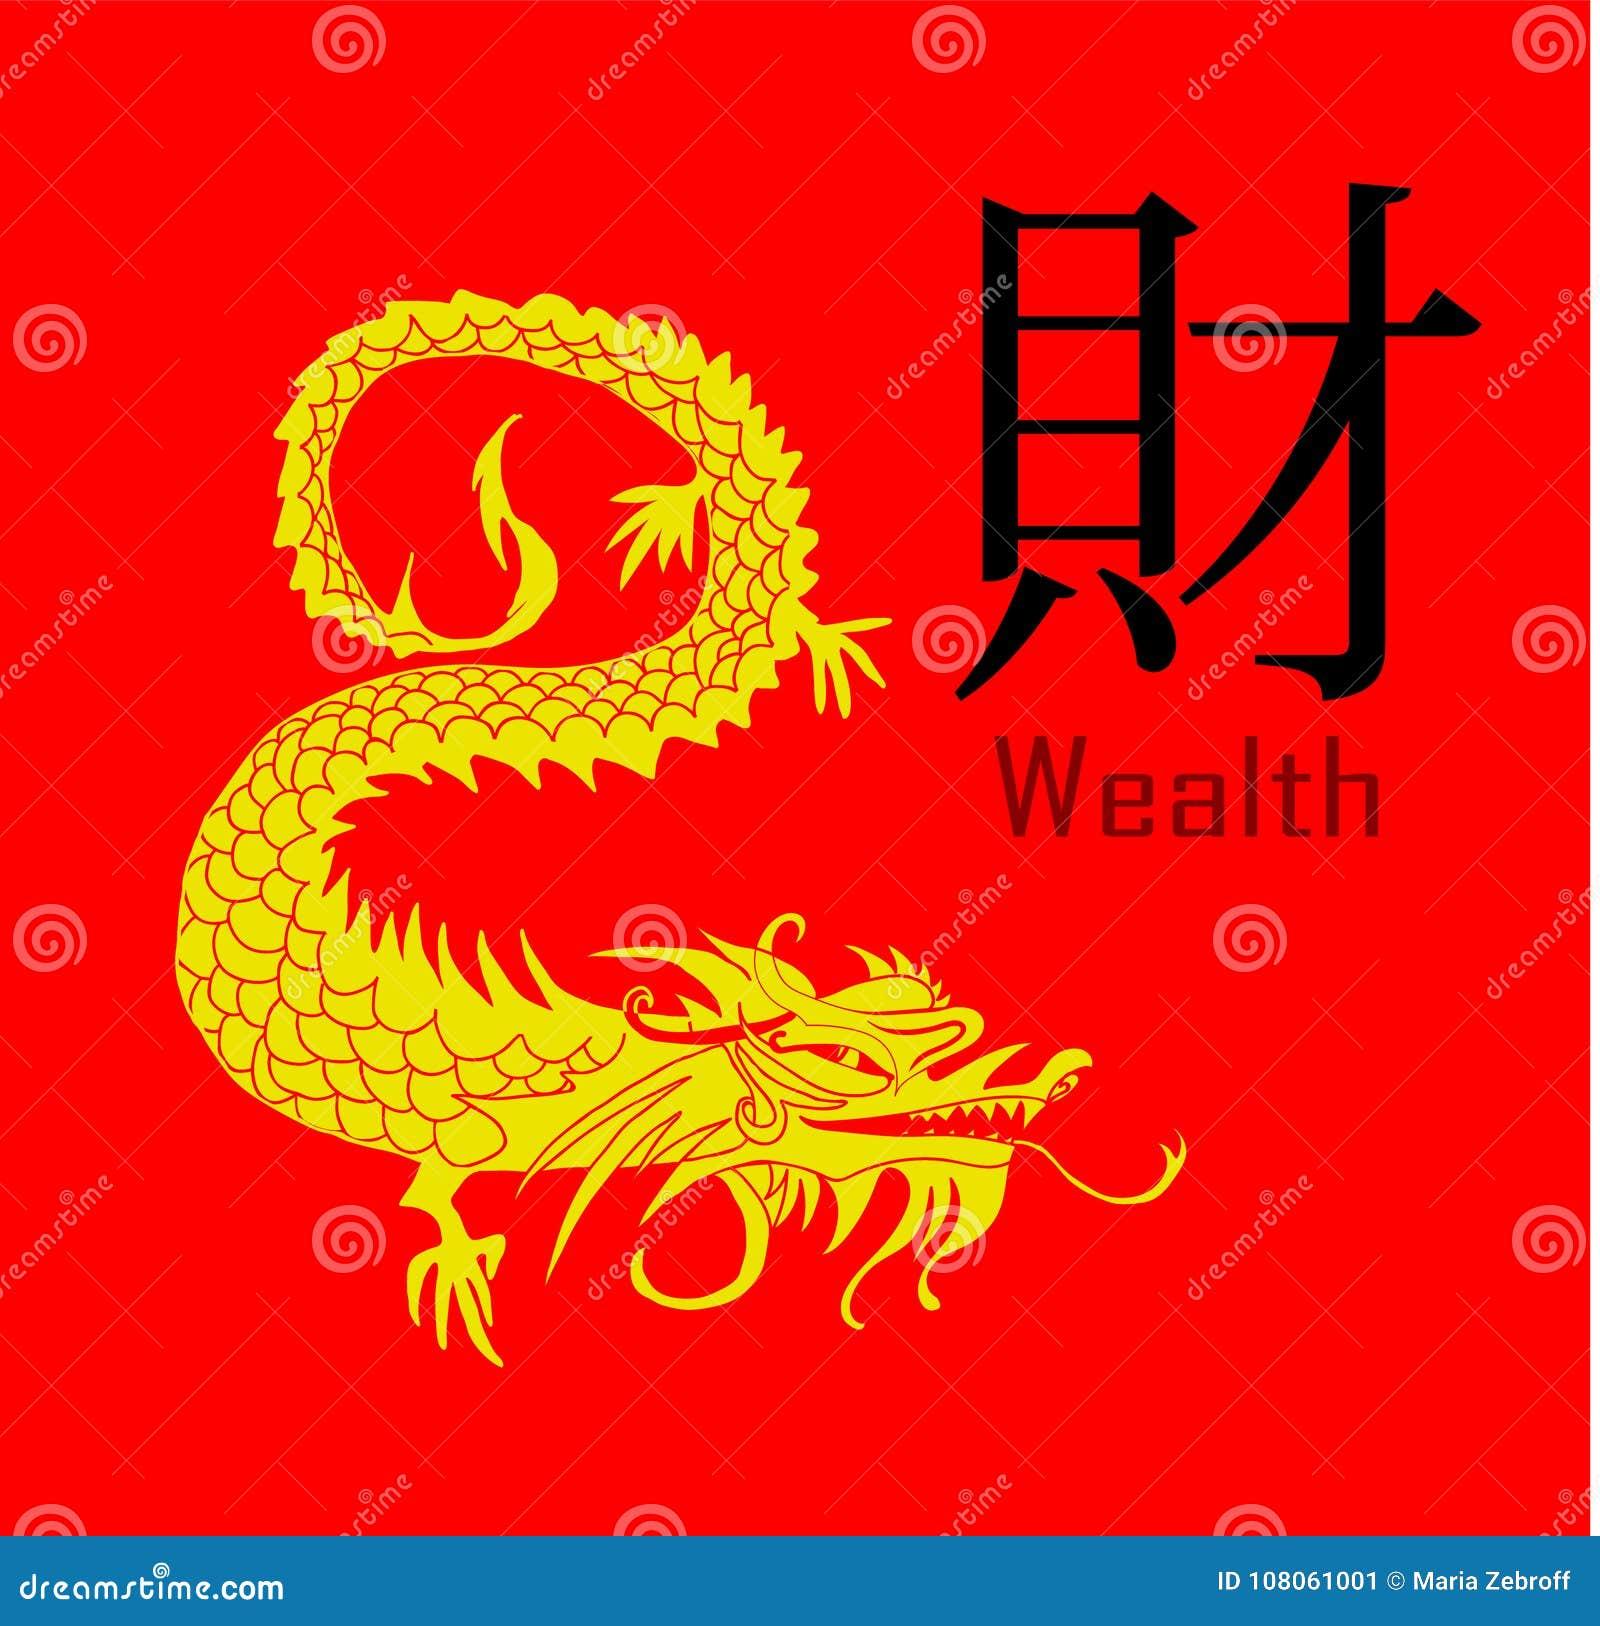 Paper cut out of a dragon china zodiac symbols stock vector paper cut out of a dragon china zodiac symbols buycottarizona Images